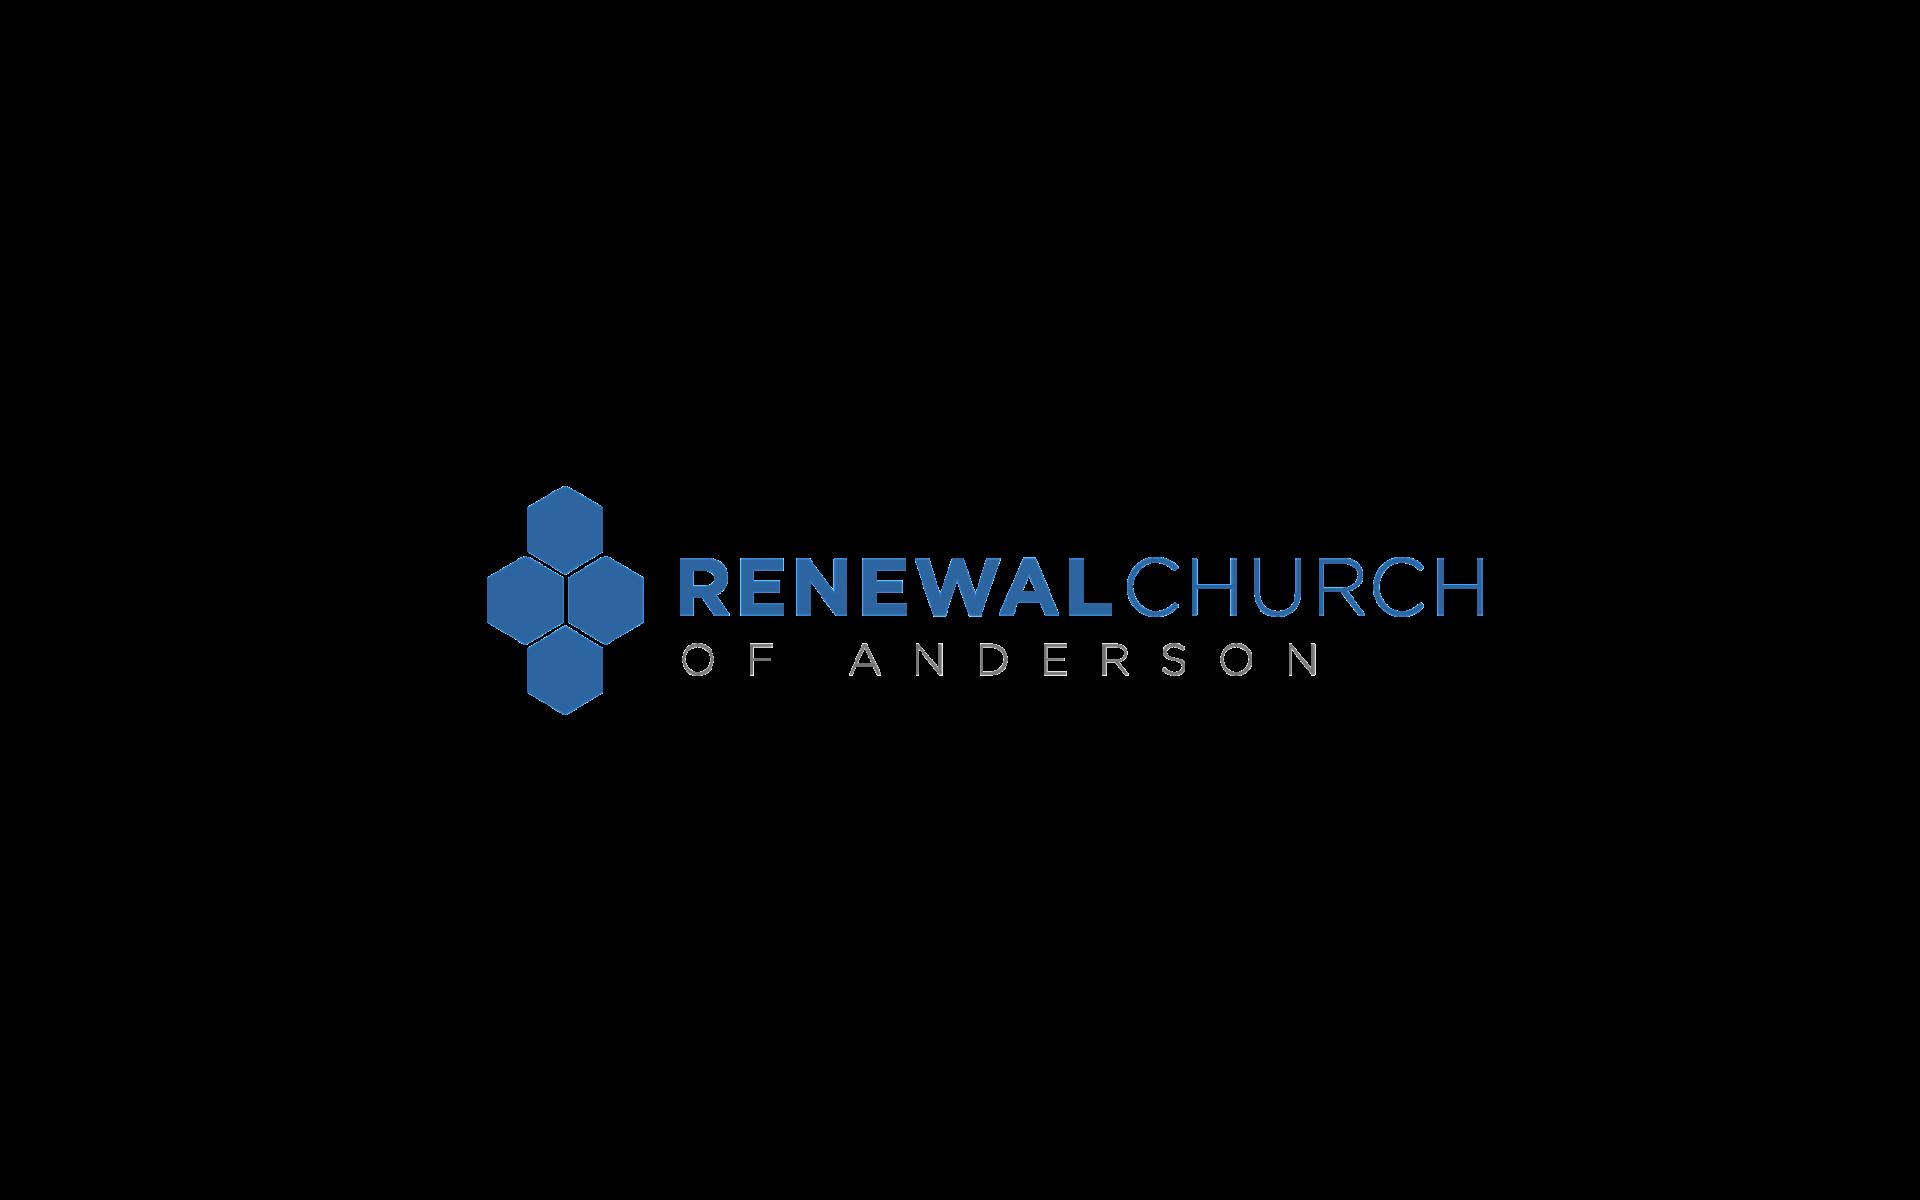 Renewal-Church-of-Anderson